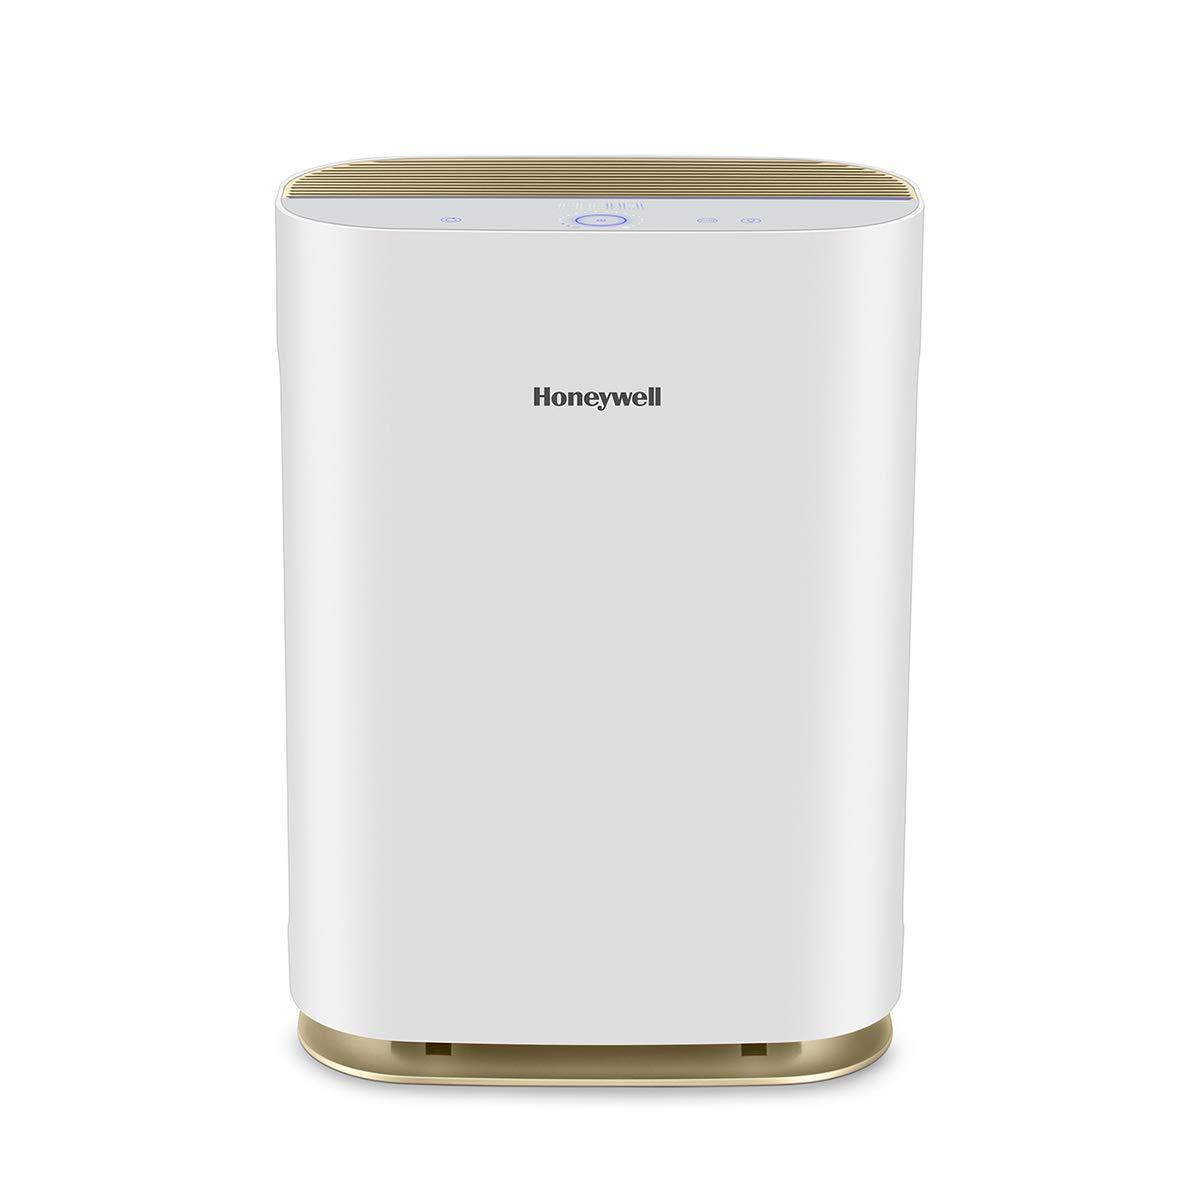 Best air purifiers in India 2020 hony-well-air-i11-1024x1024.jpg